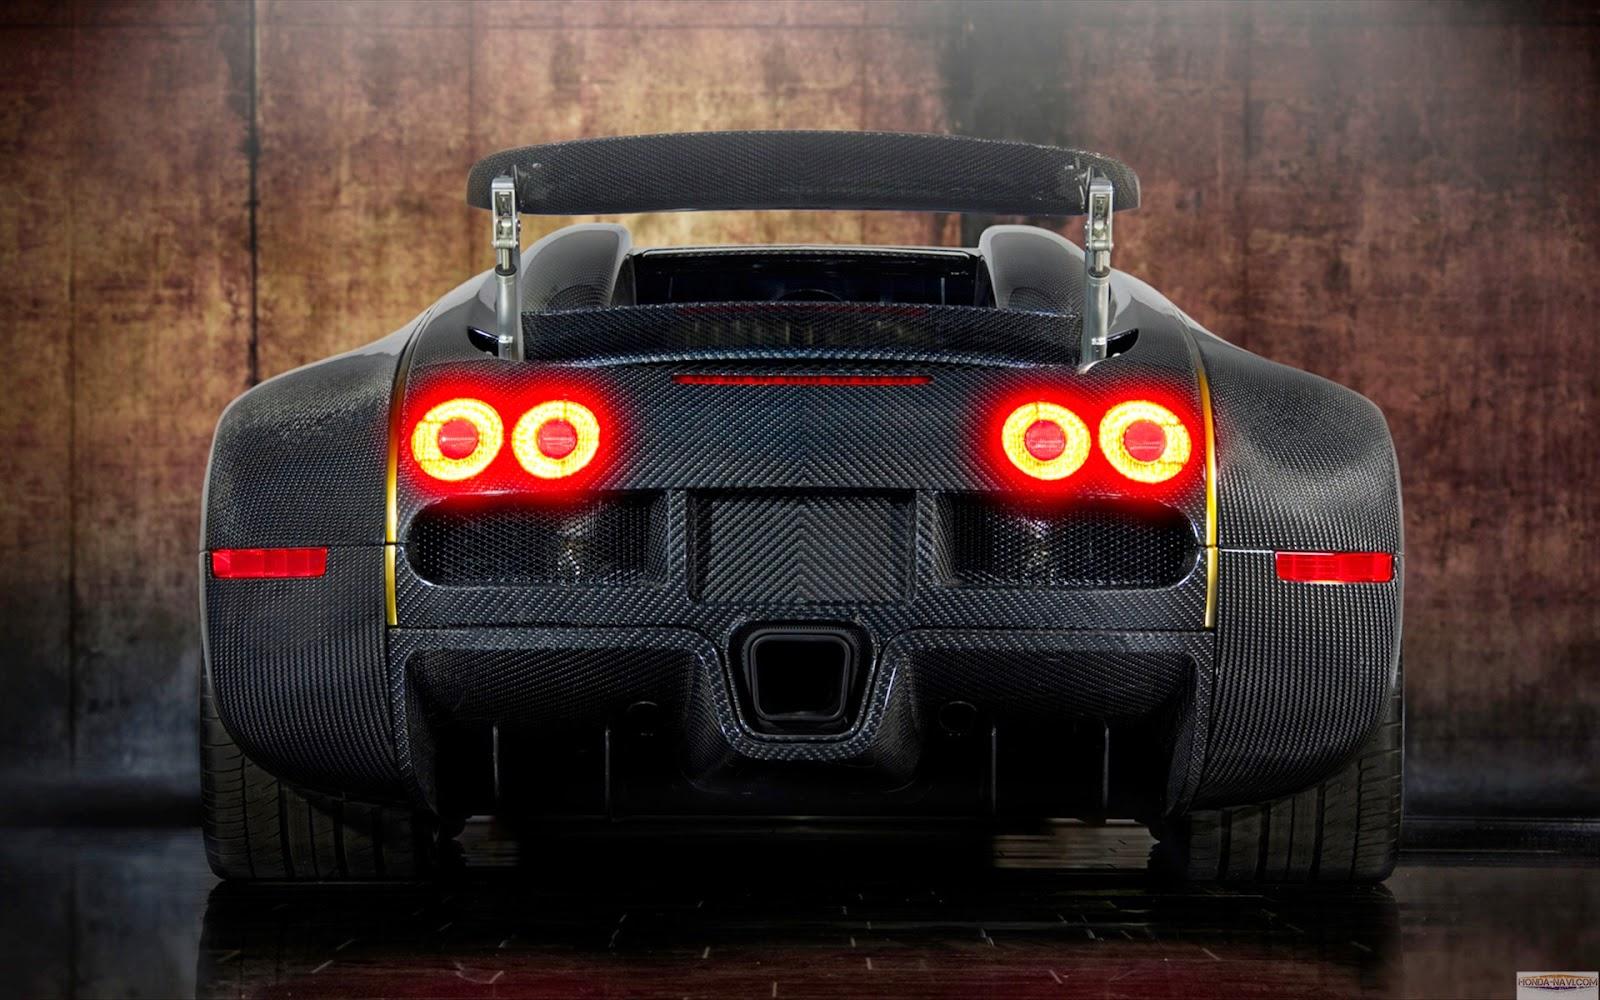 Wallpapers Hd Autos Fondos De Pantallas Hd: Wallpapers Bugatti Veyron Full HD